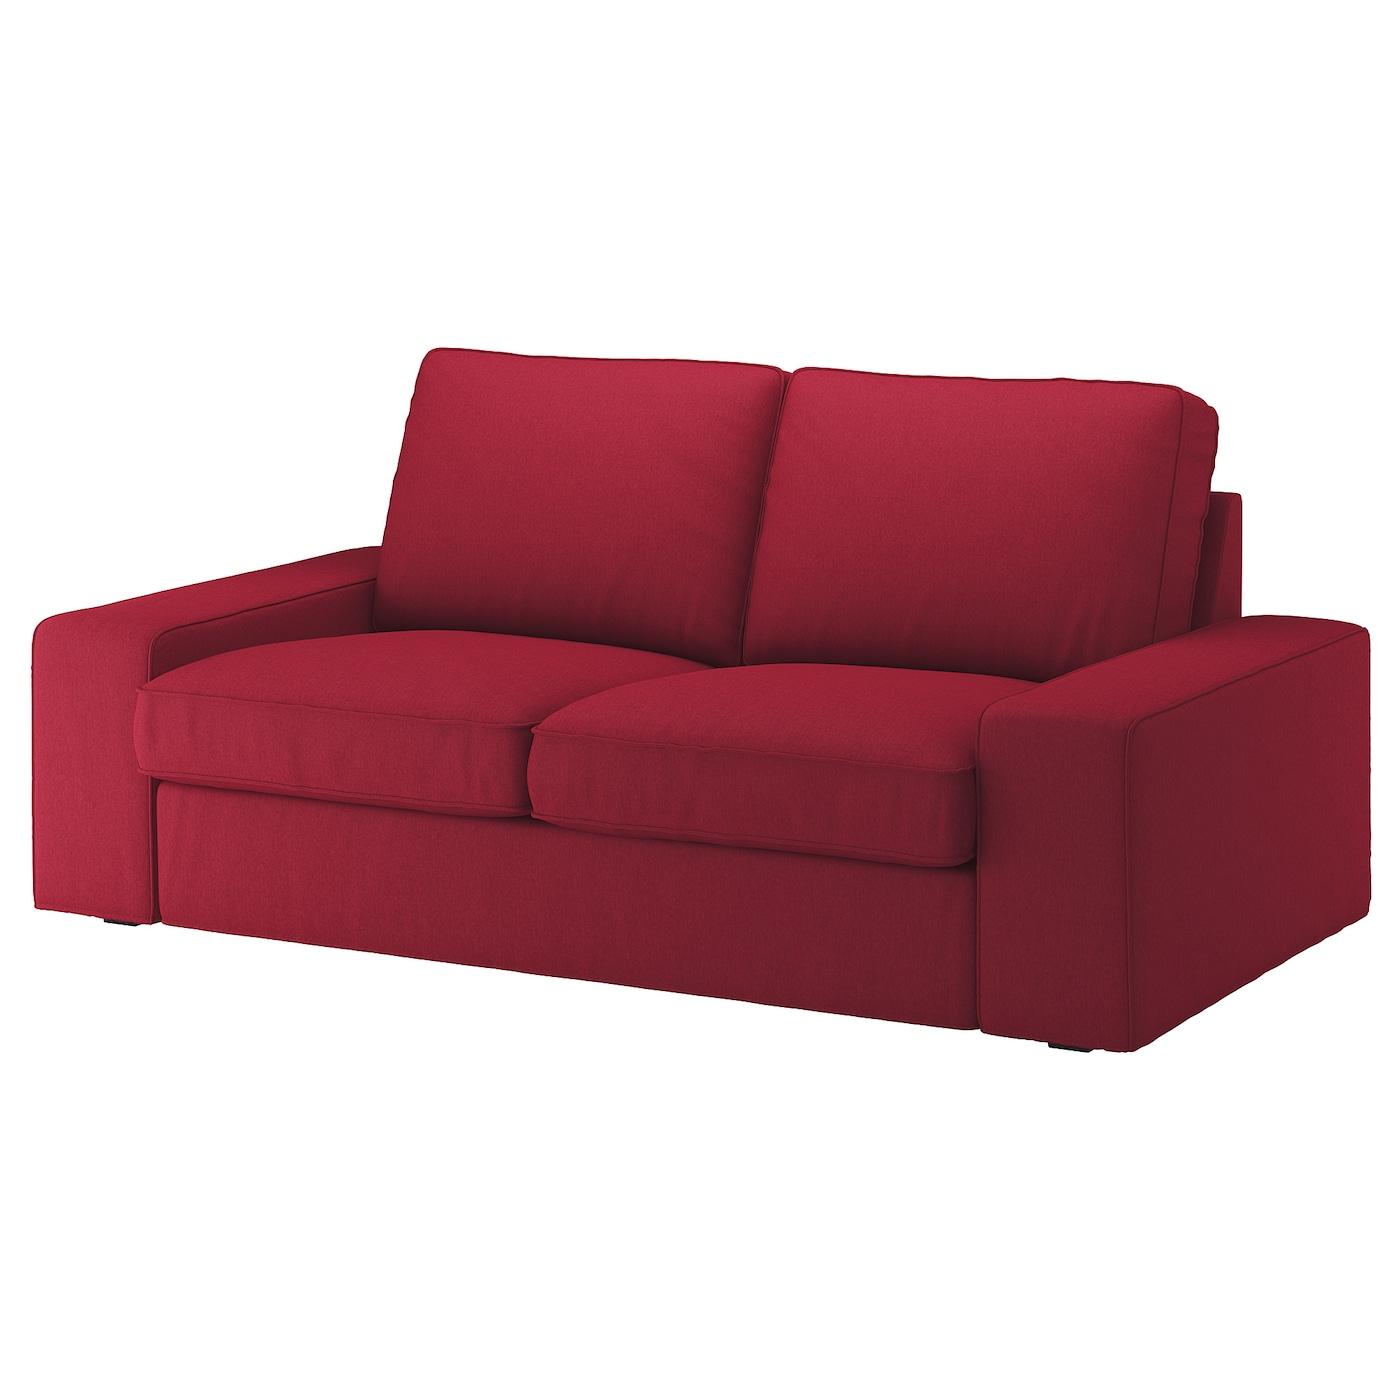 Kivik Two Seat Sofa Orrsta Red